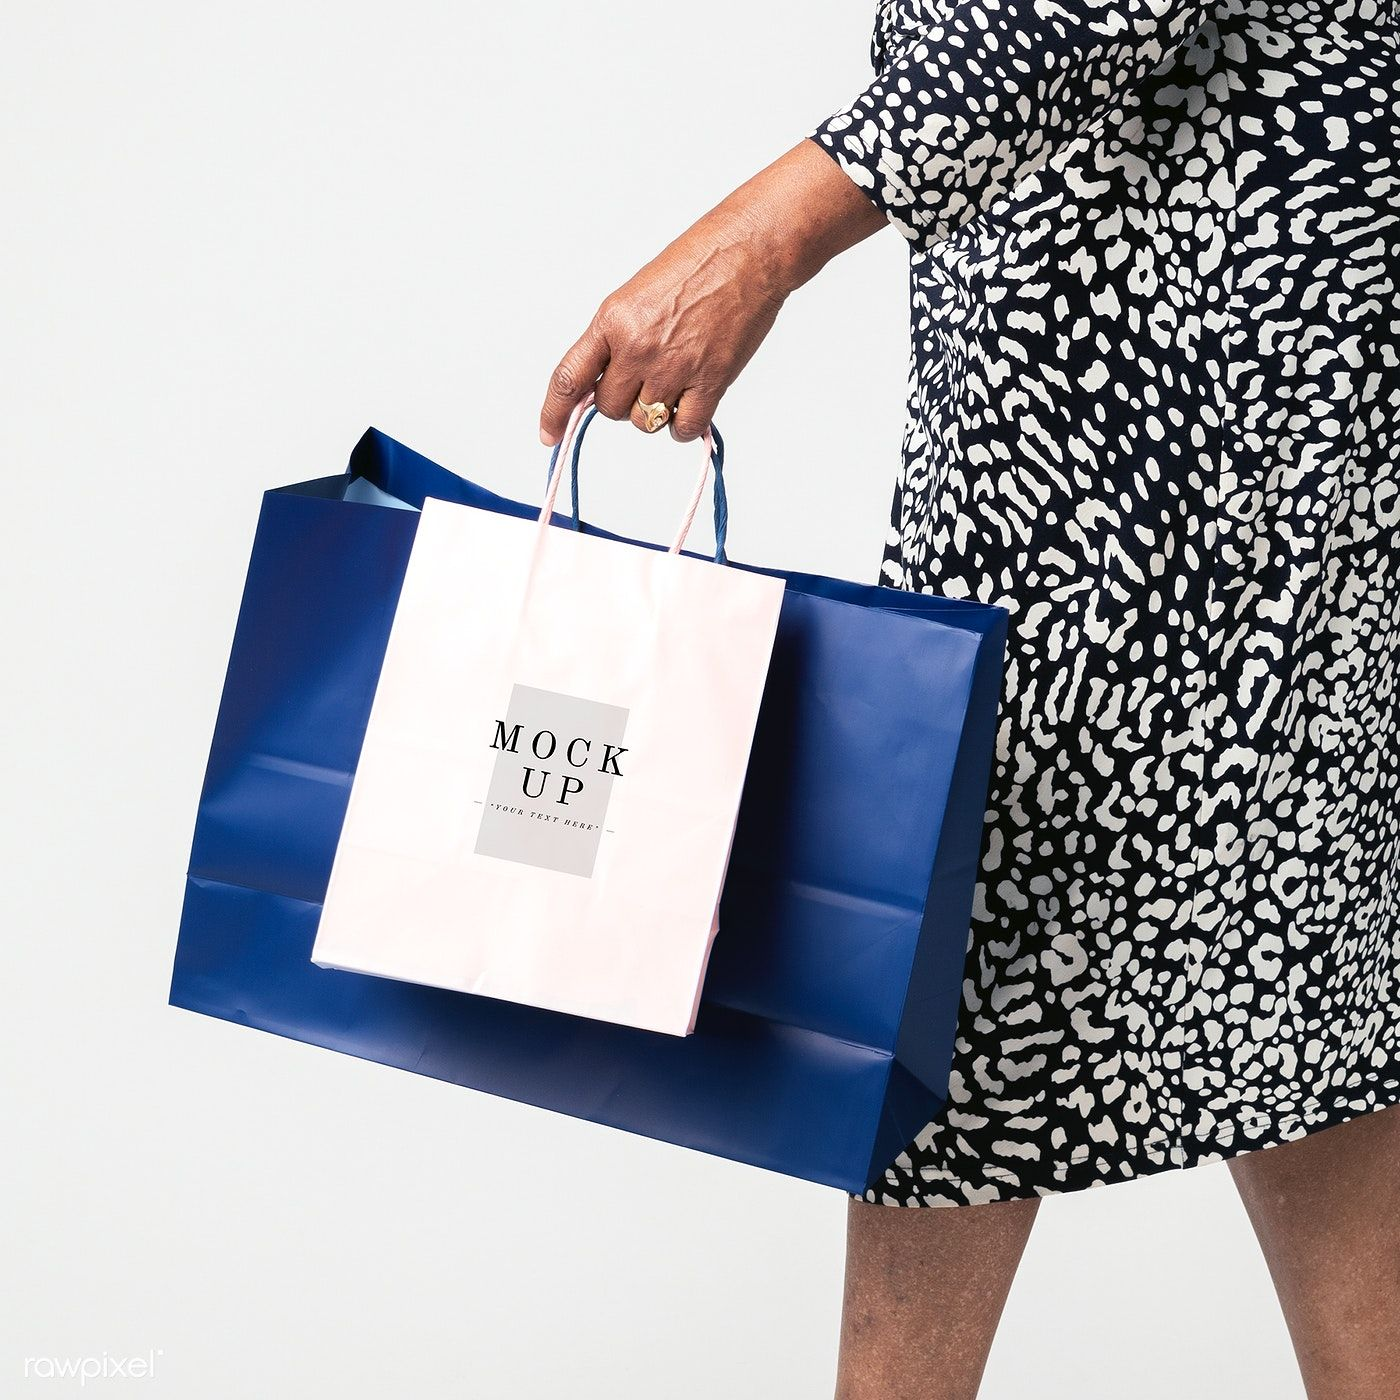 Download Black Woman Carrying Shopping Bag Mockups Premium Image By Rawpixel Com Mckinsey Bag Mockup Design Mockup Free Bags